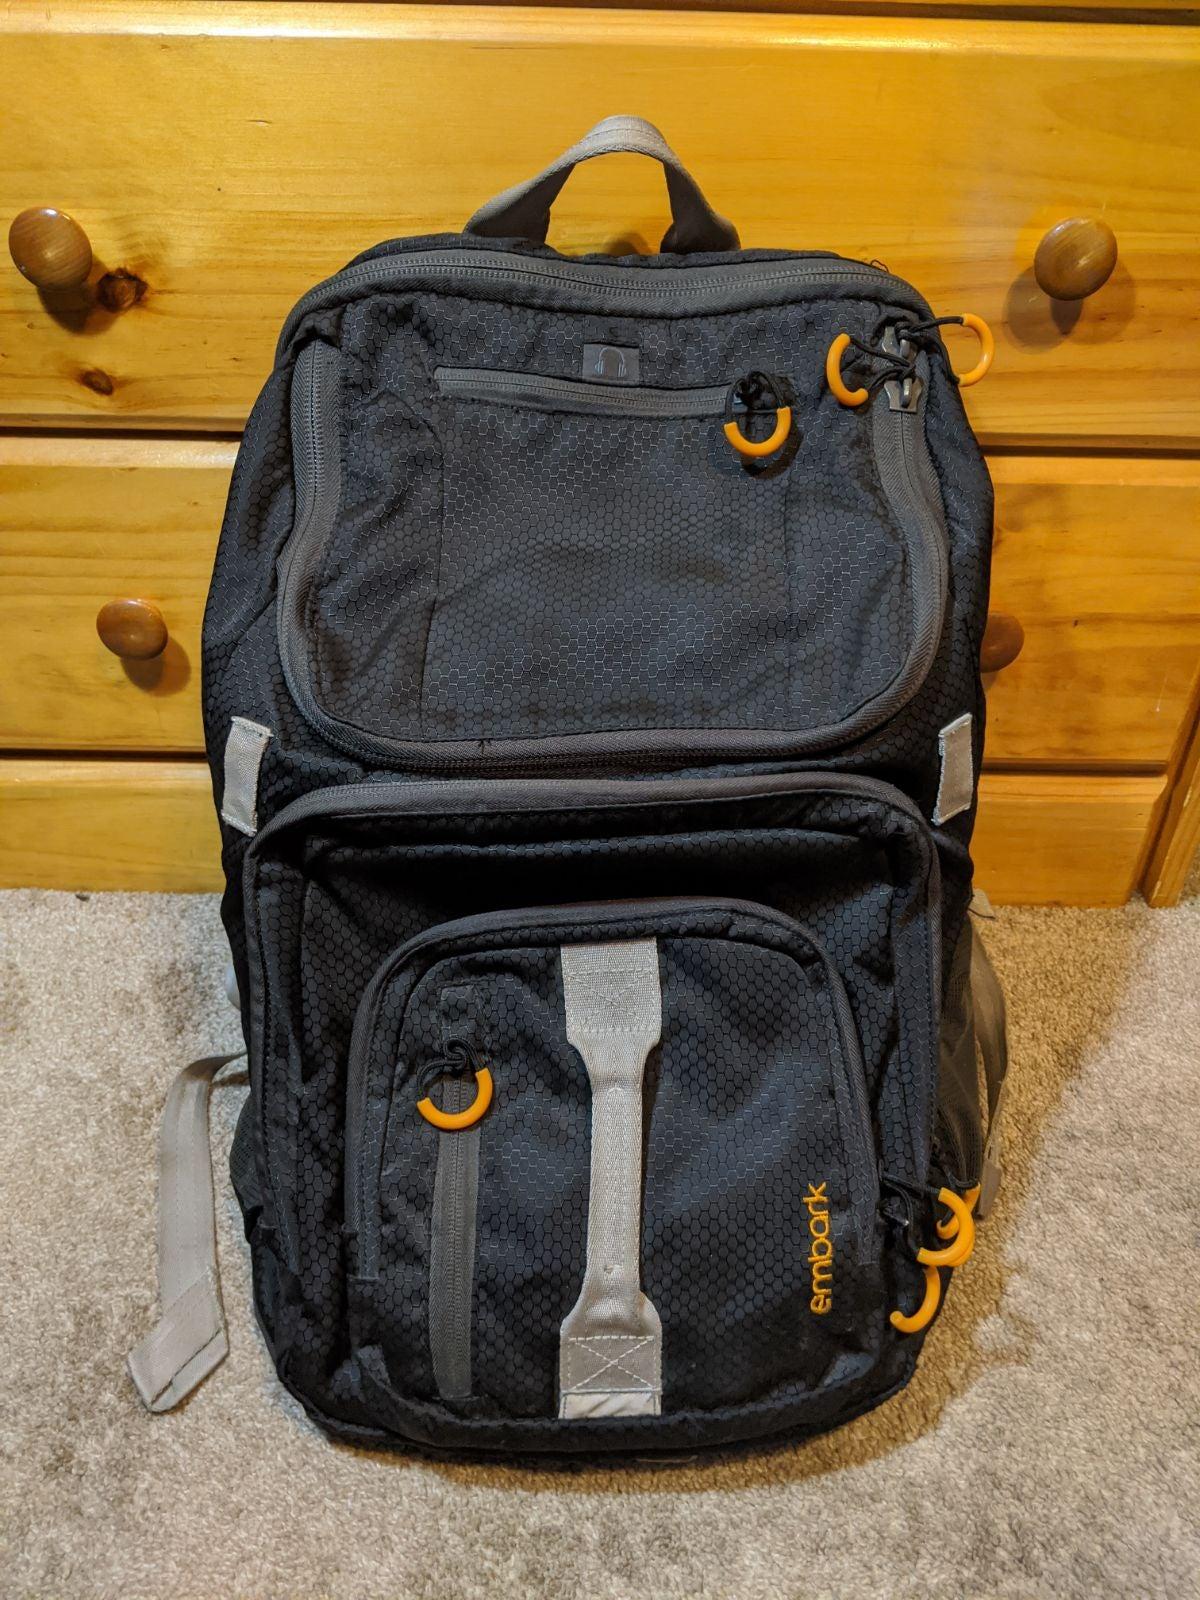 Embark Backpack Black/Orange